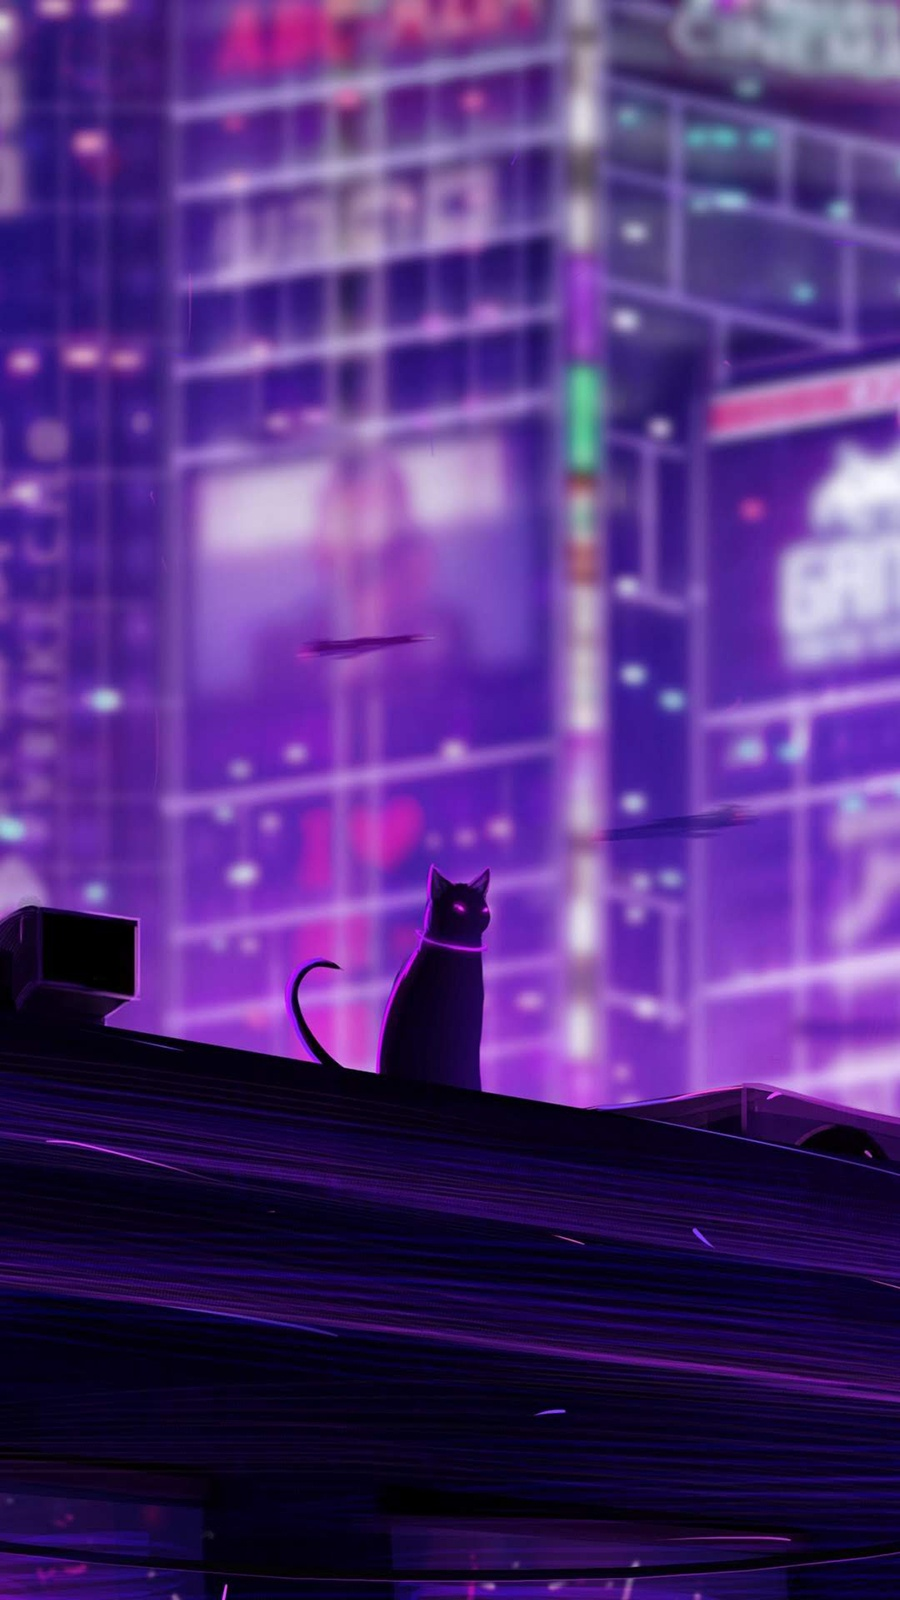 cat wallpaper aesthetic